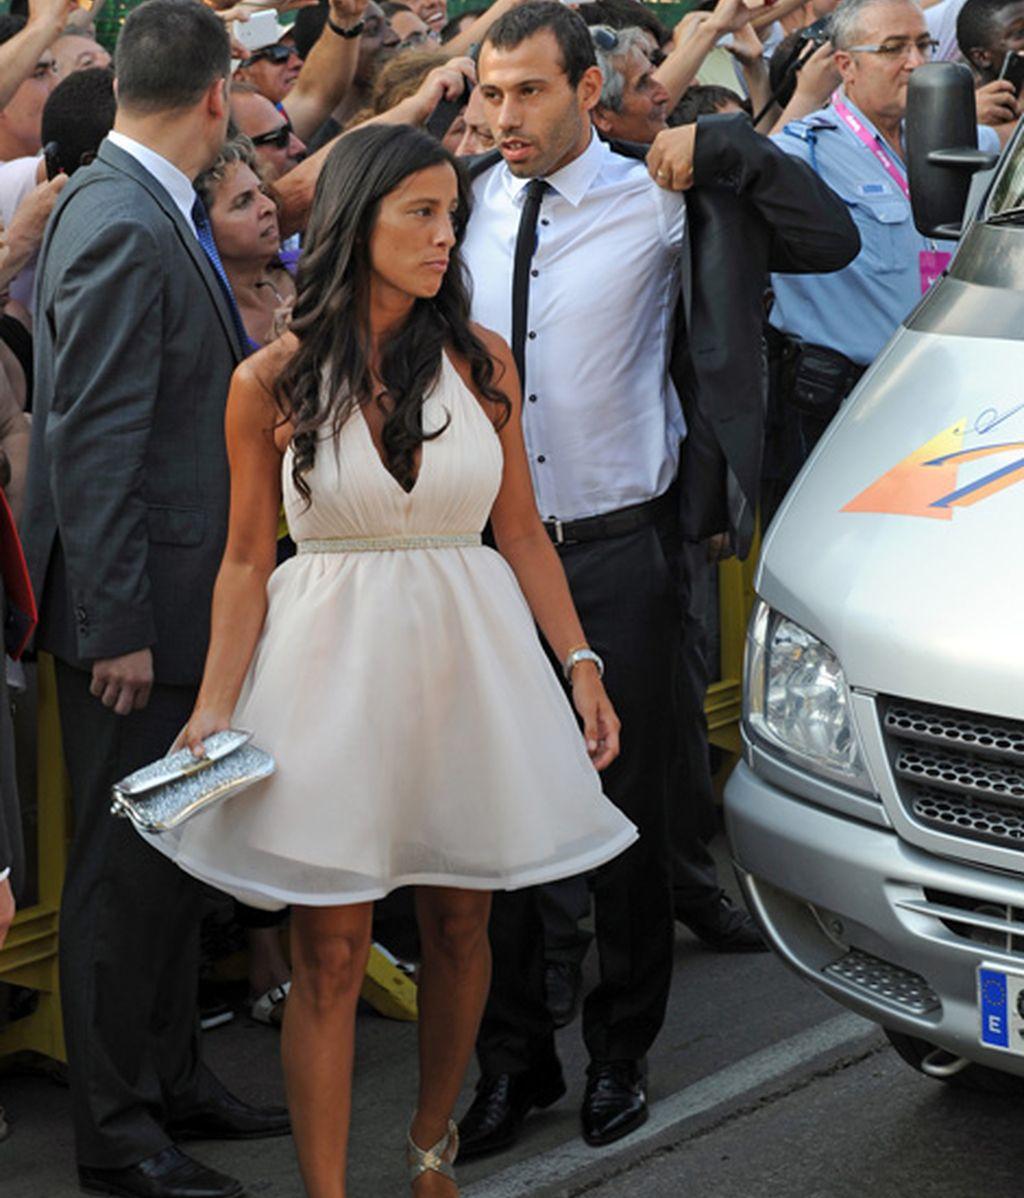 La boda de Xavi Hernández